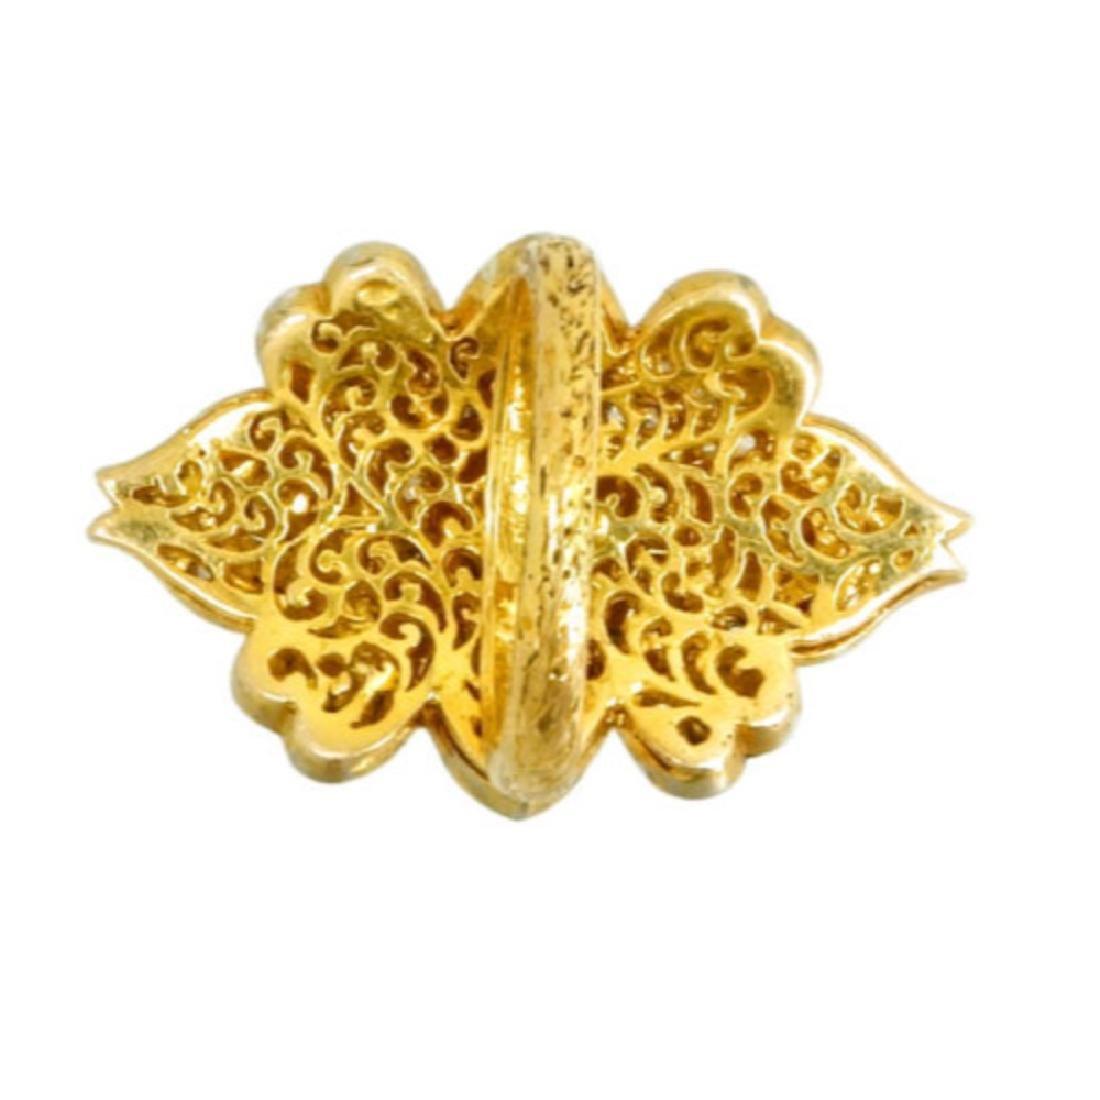 Natural Rose Cut Diamond Pave Ring. 14K Yellow Gold - 3